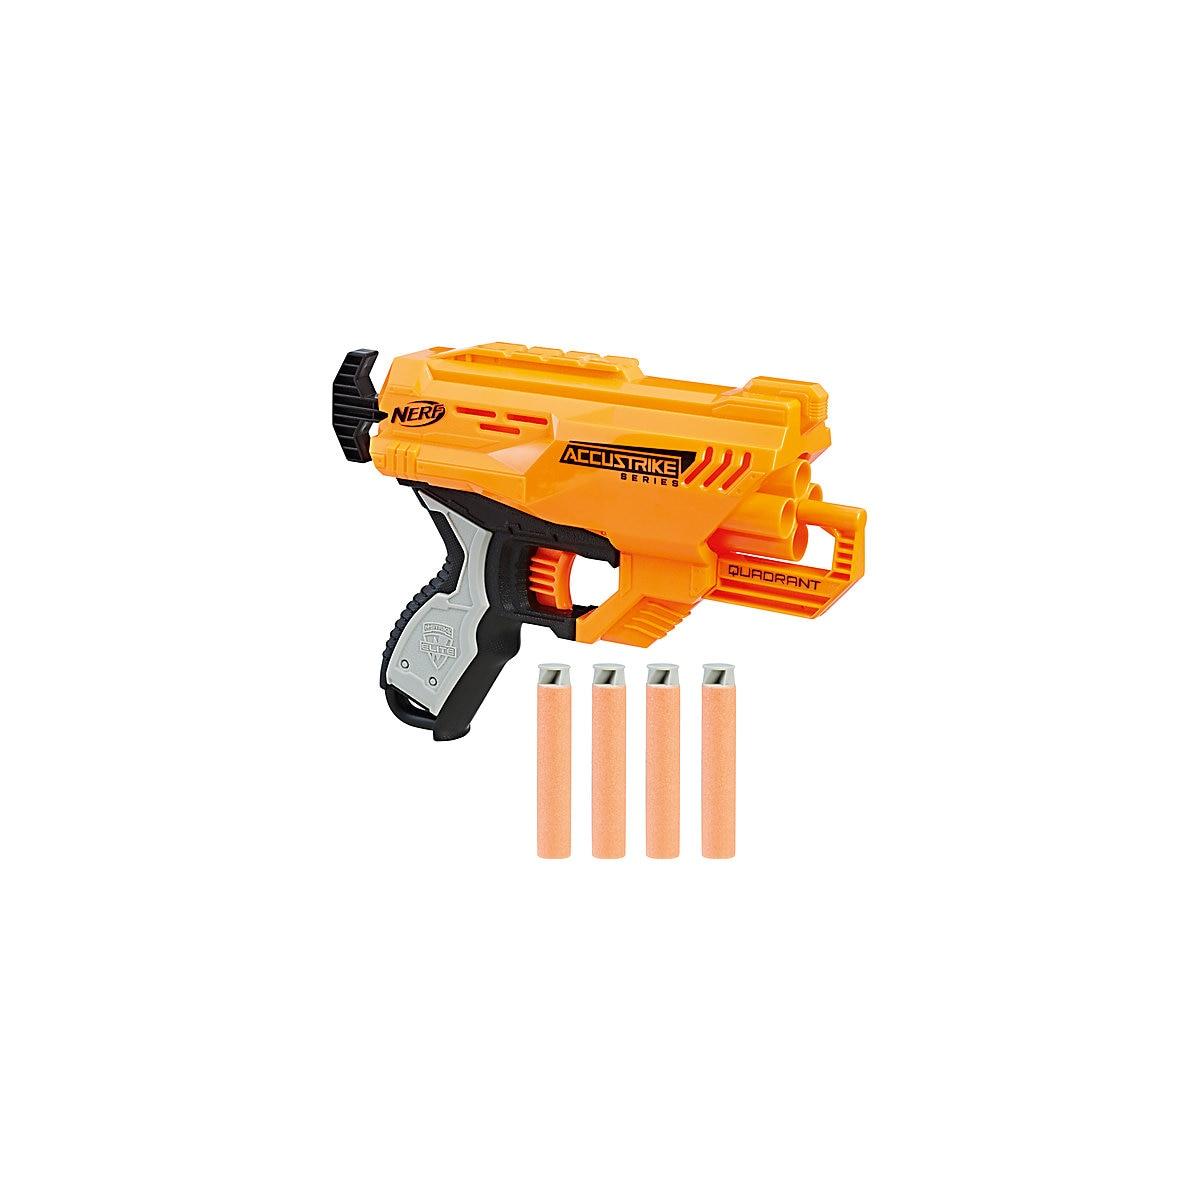 NERF Toy Guns 7922857 gun weapon toys games pneumatic blaster boy orbiz revolver Outdoor Fun Sports MTpromo